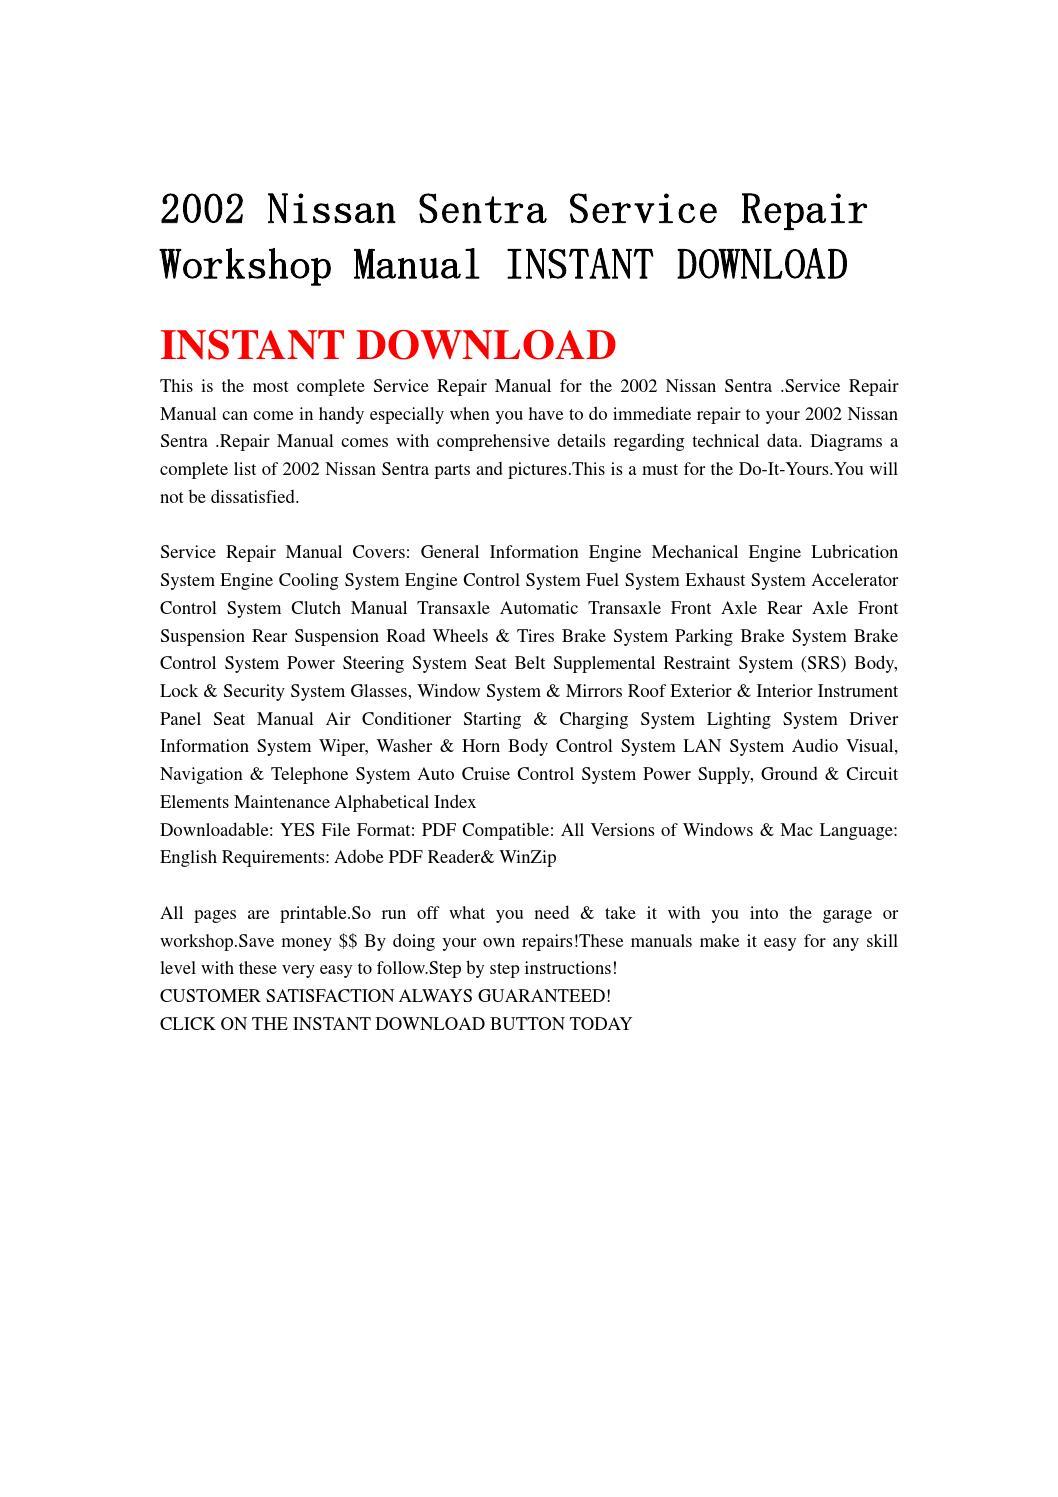 Nissan Sentra Service Manual: Can